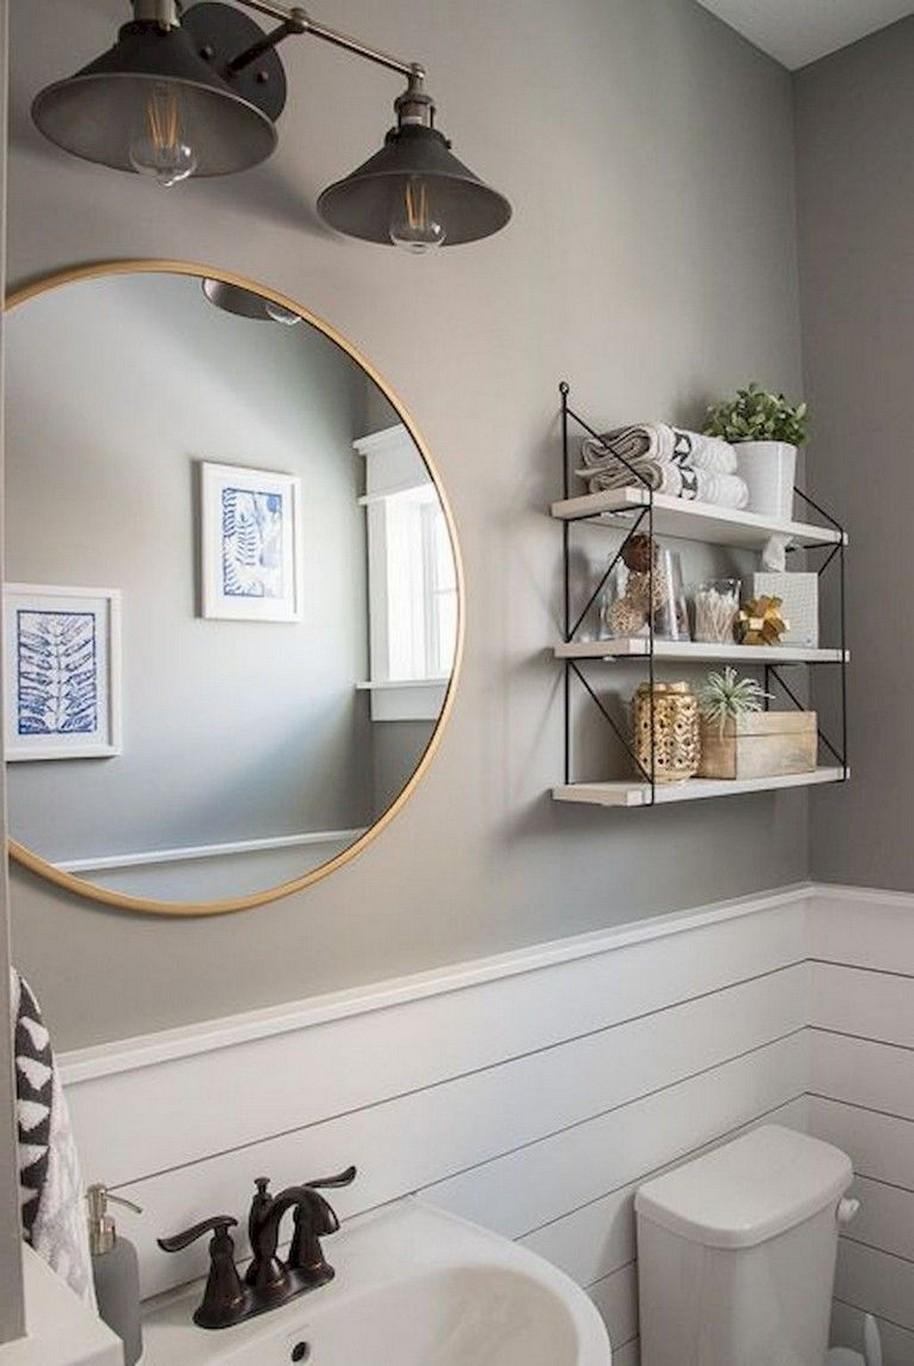 83 Modern Bathroom Design Some Tips Home Decor 43